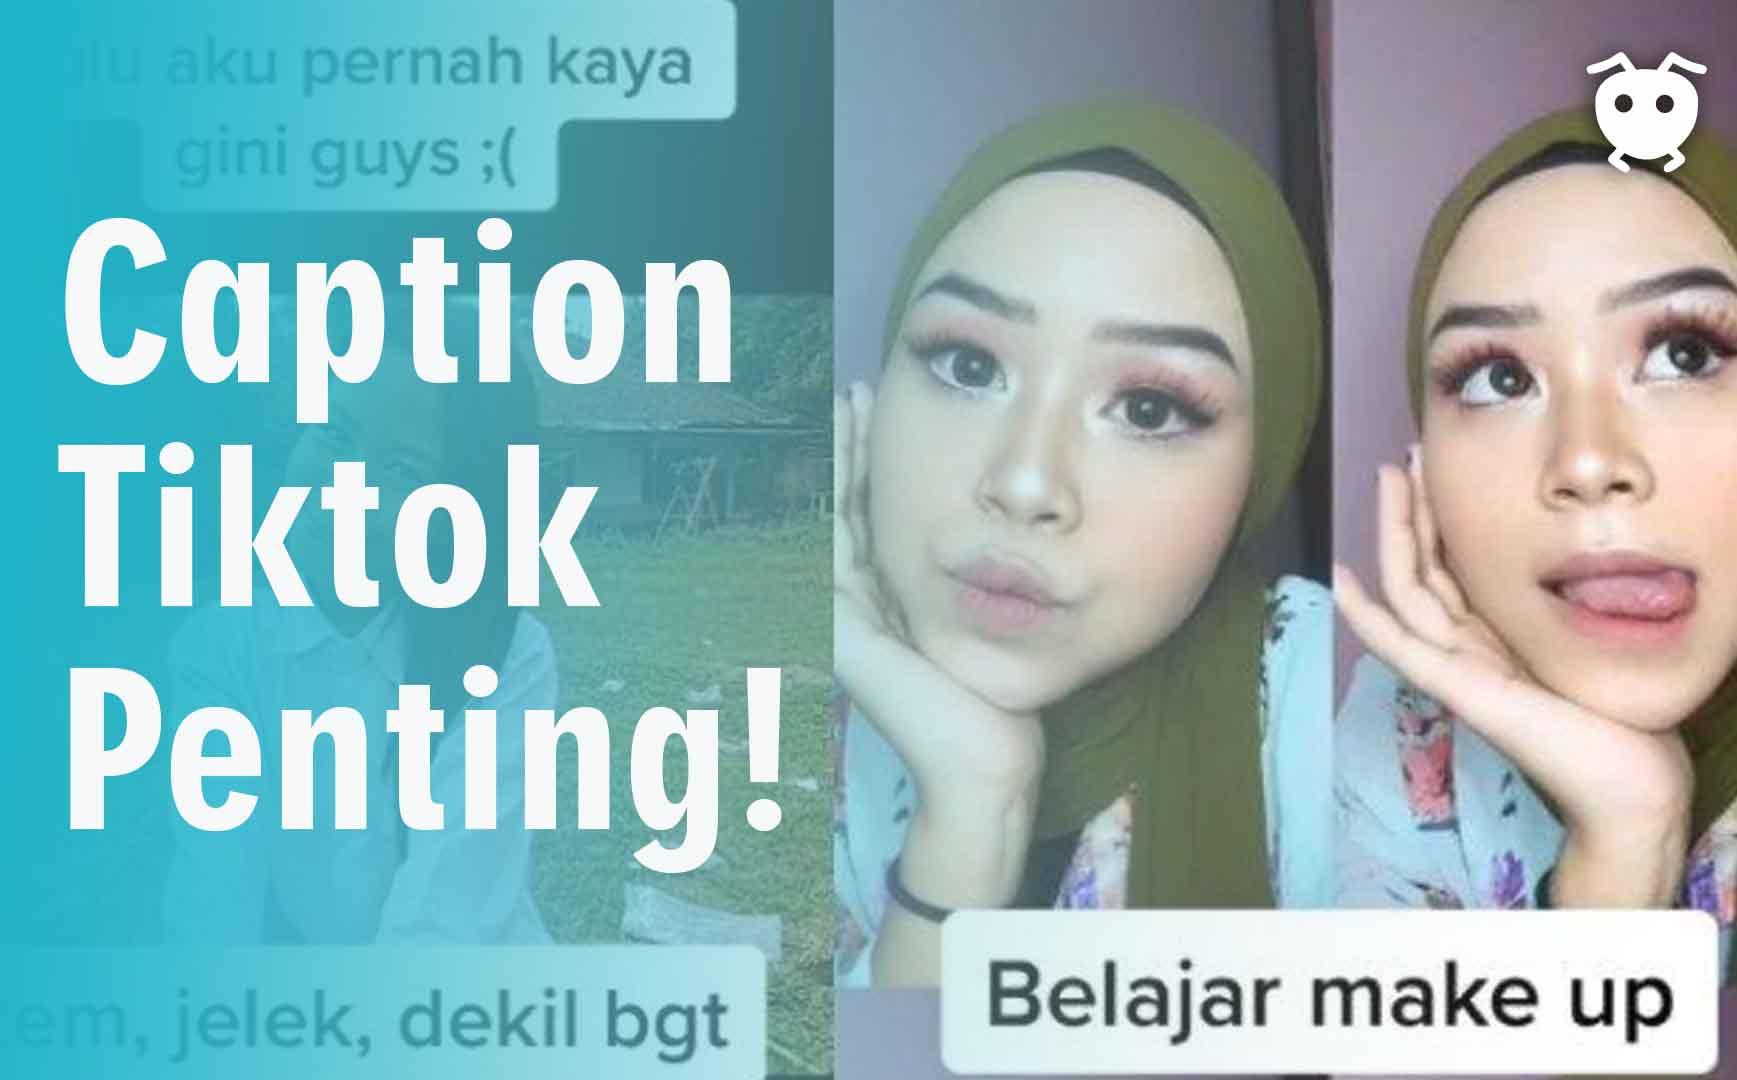 Caption Tiktok